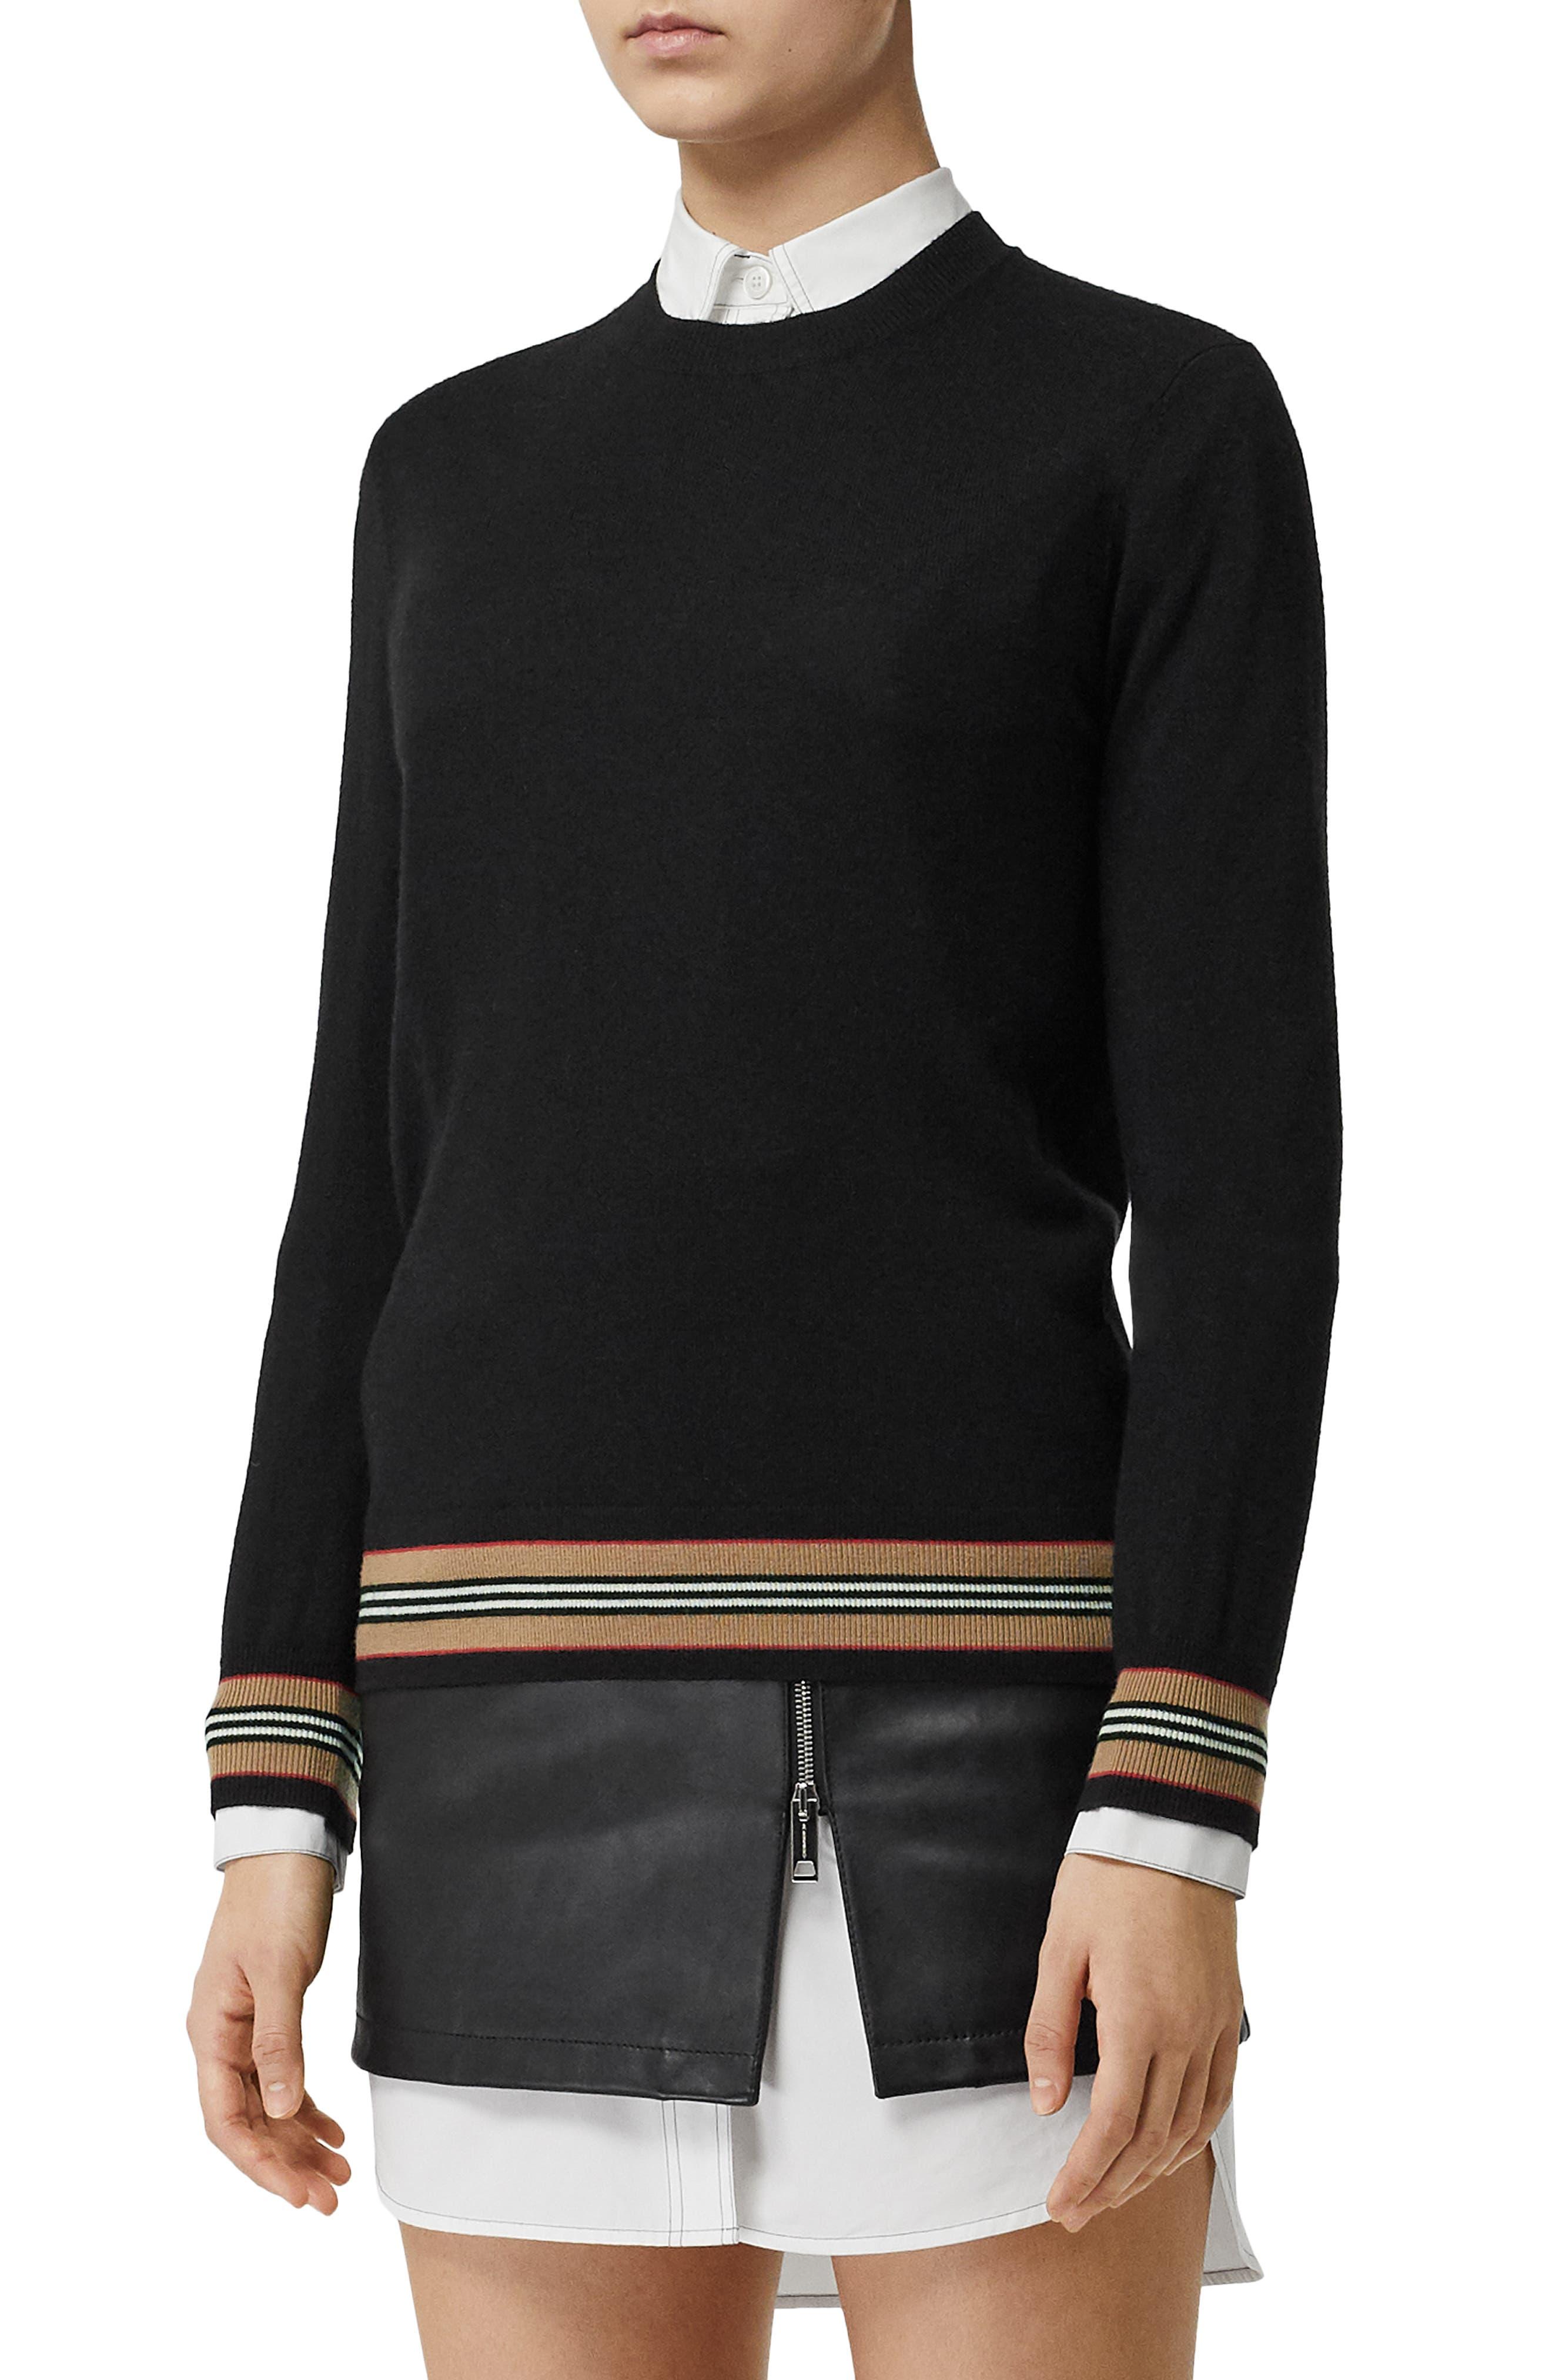 Burberry Stripe Trim Merino Wool Sweater, Black